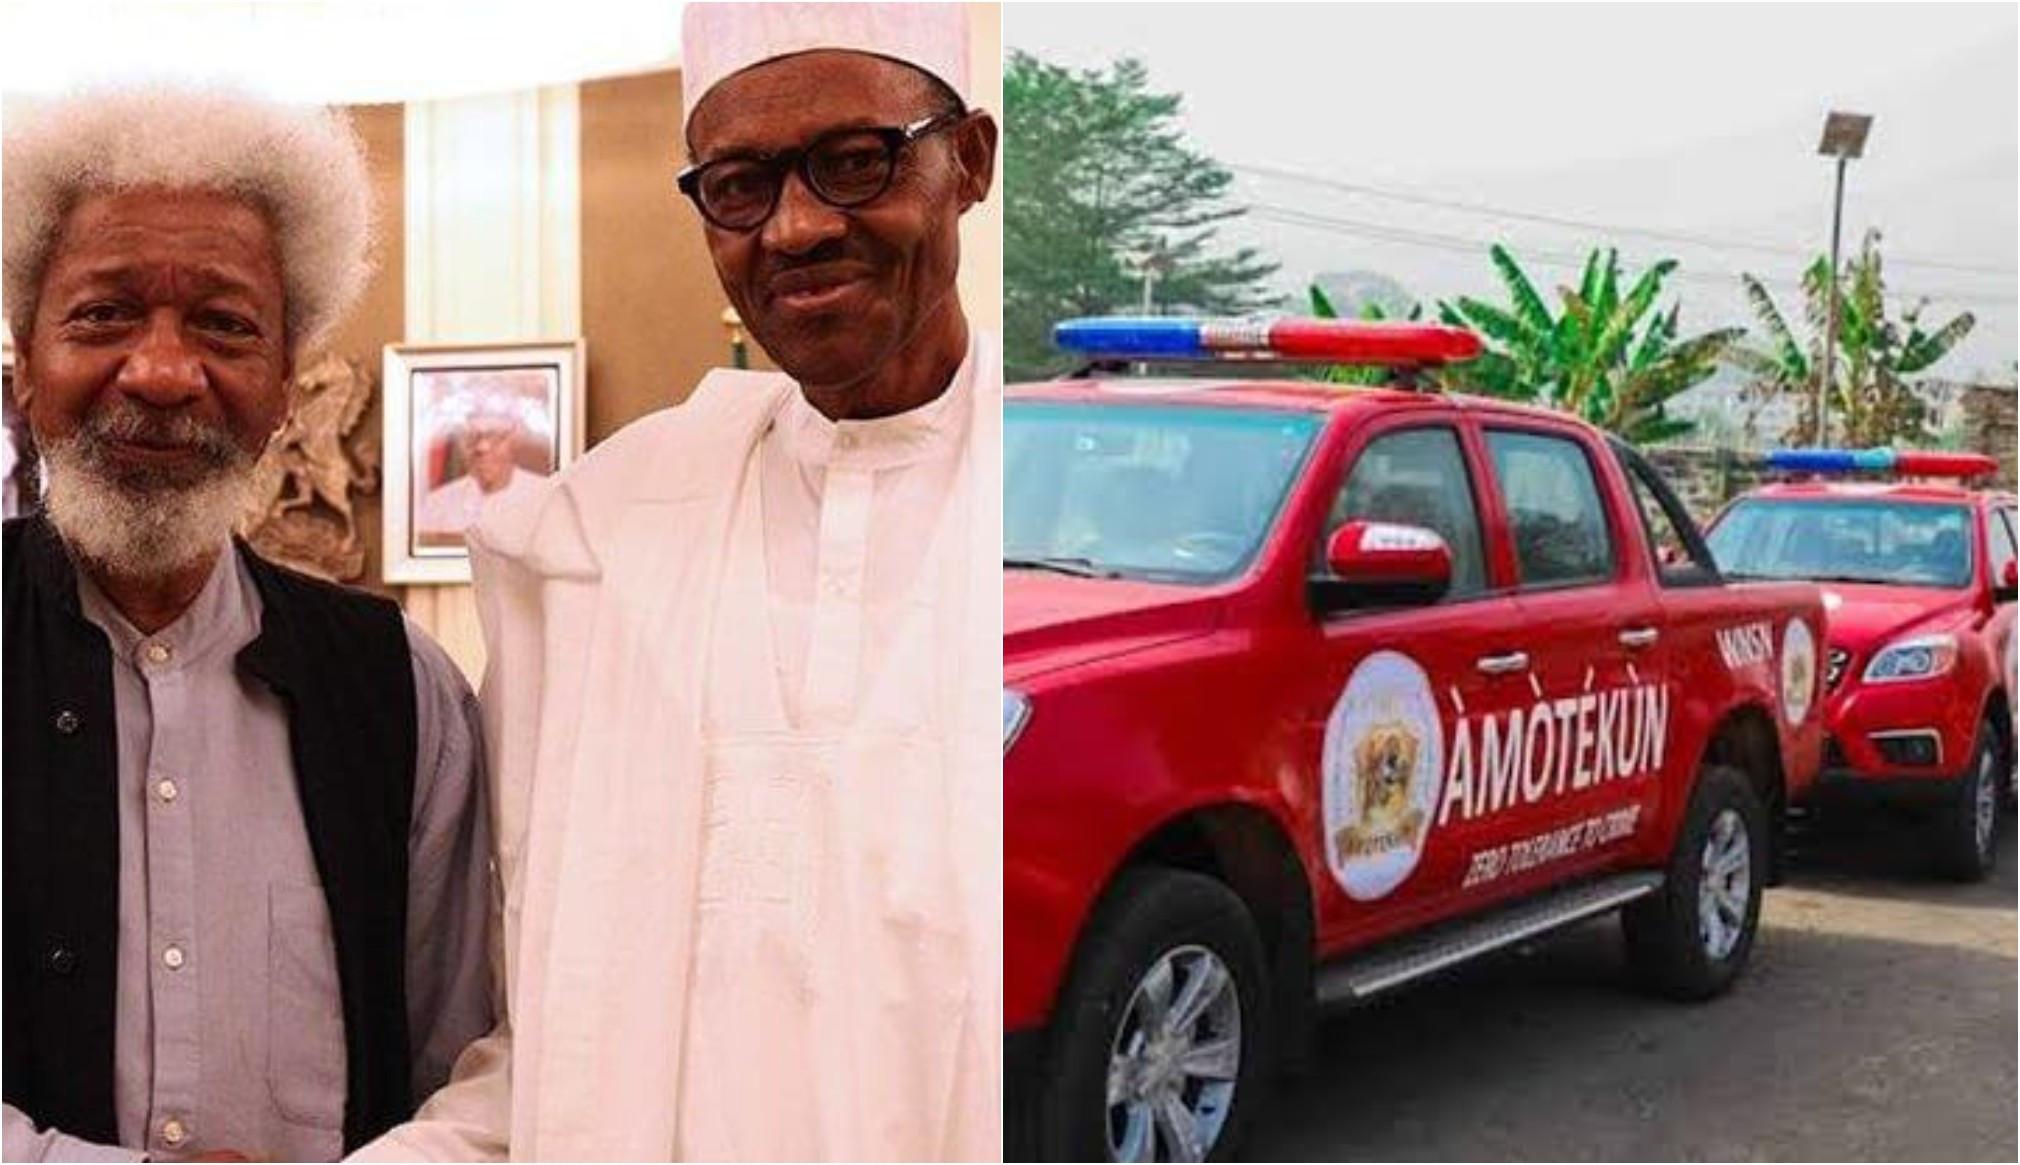 You slept while Nigerians were killed - Soyinka slams FG for outlawing Amotekun